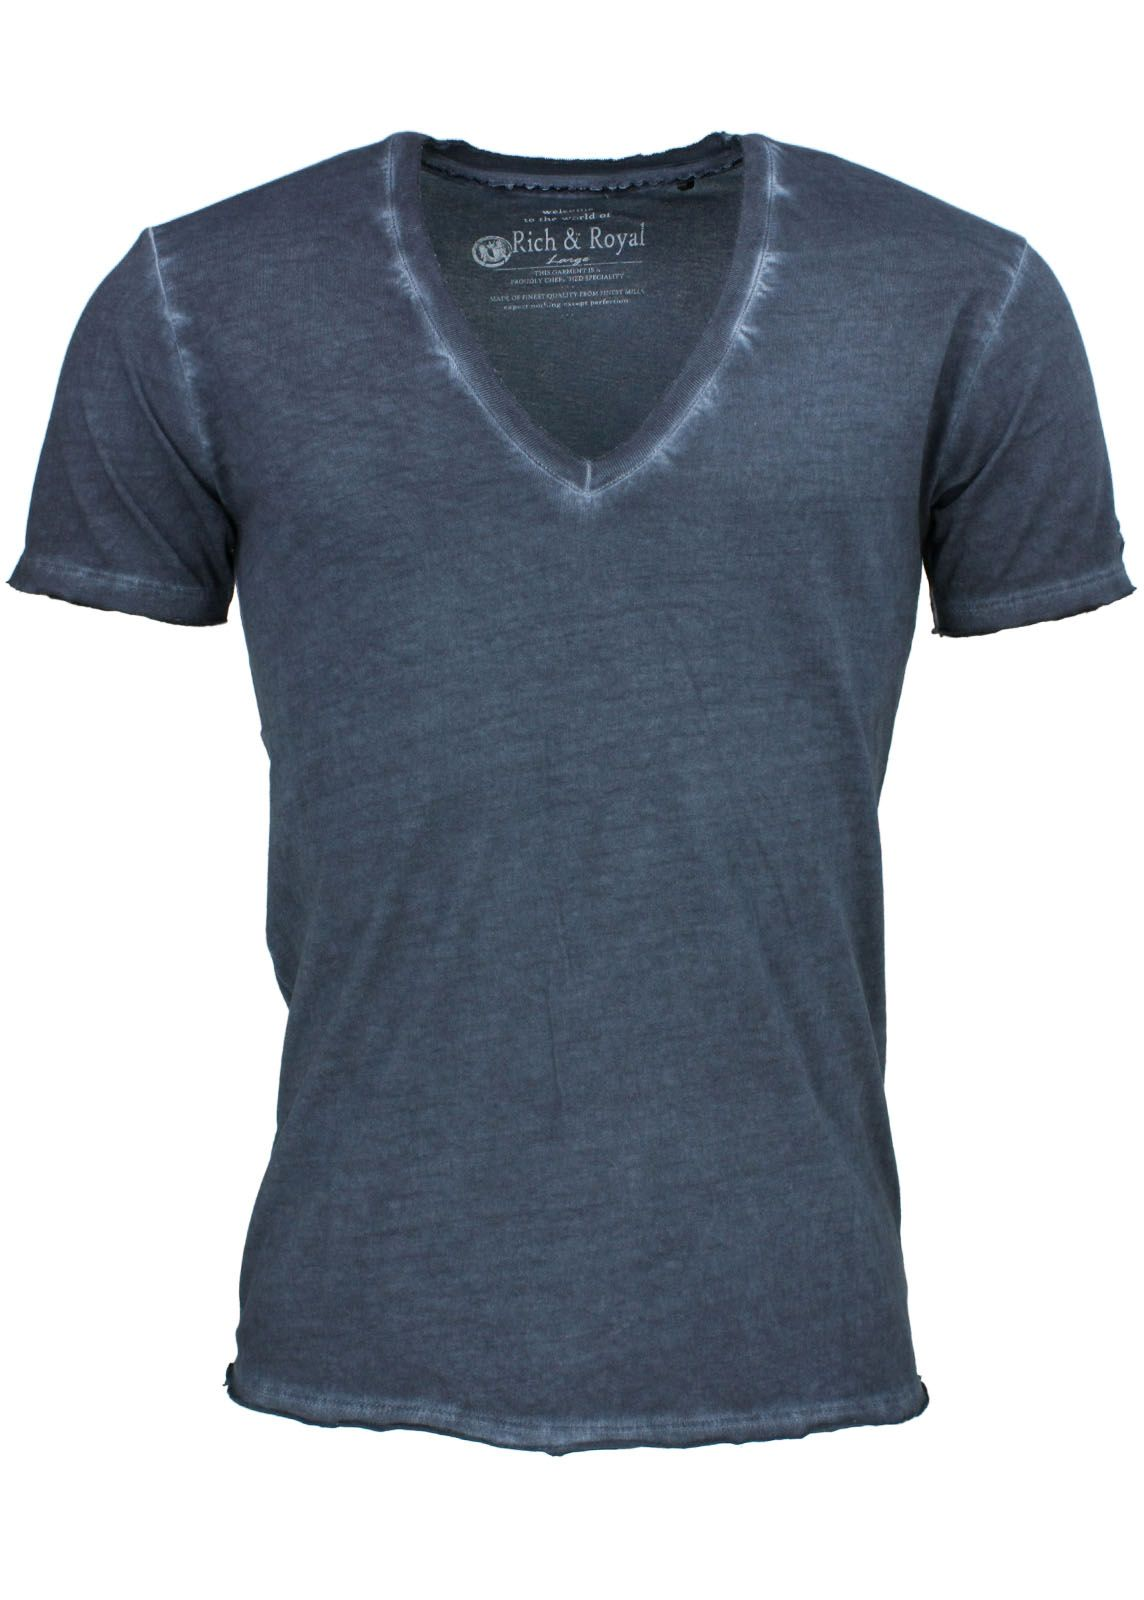 rich royal t shirt night blue fettebeute online shop. Black Bedroom Furniture Sets. Home Design Ideas